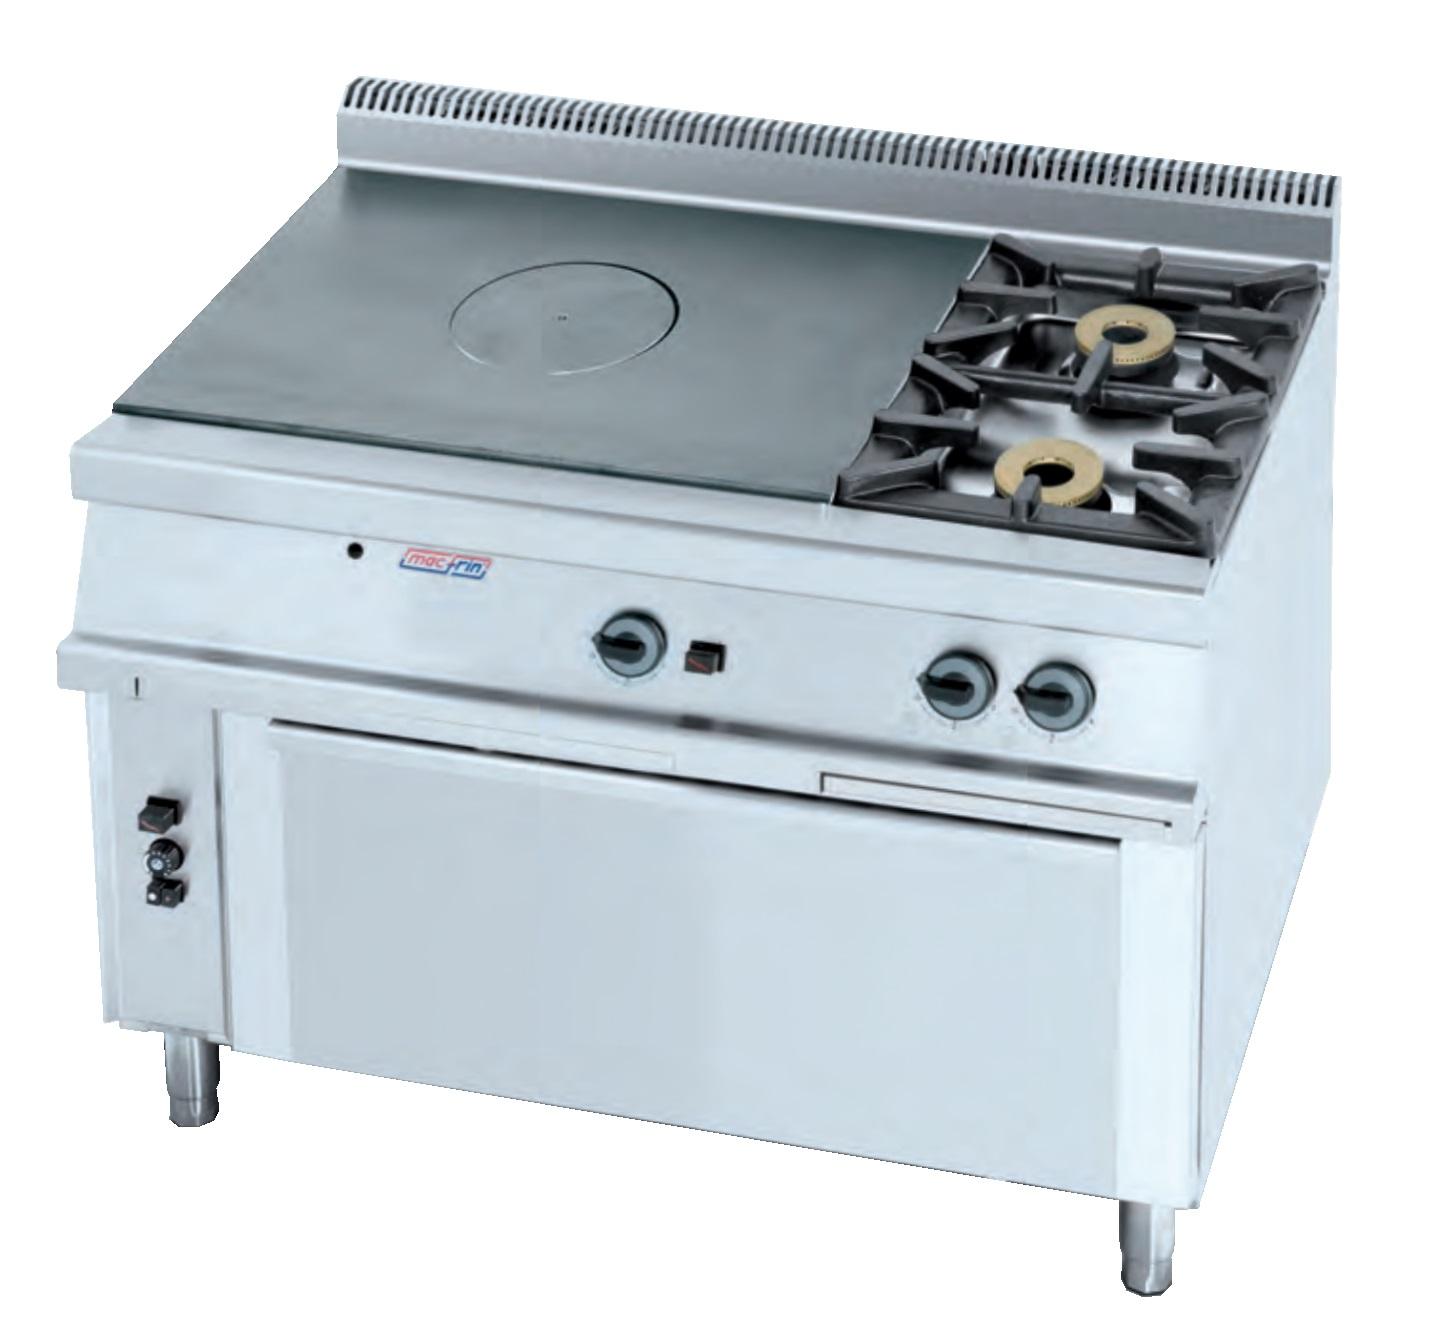 Cocina plancha a gas eurast 5011 3 fuegos - Cocina con plancha ...